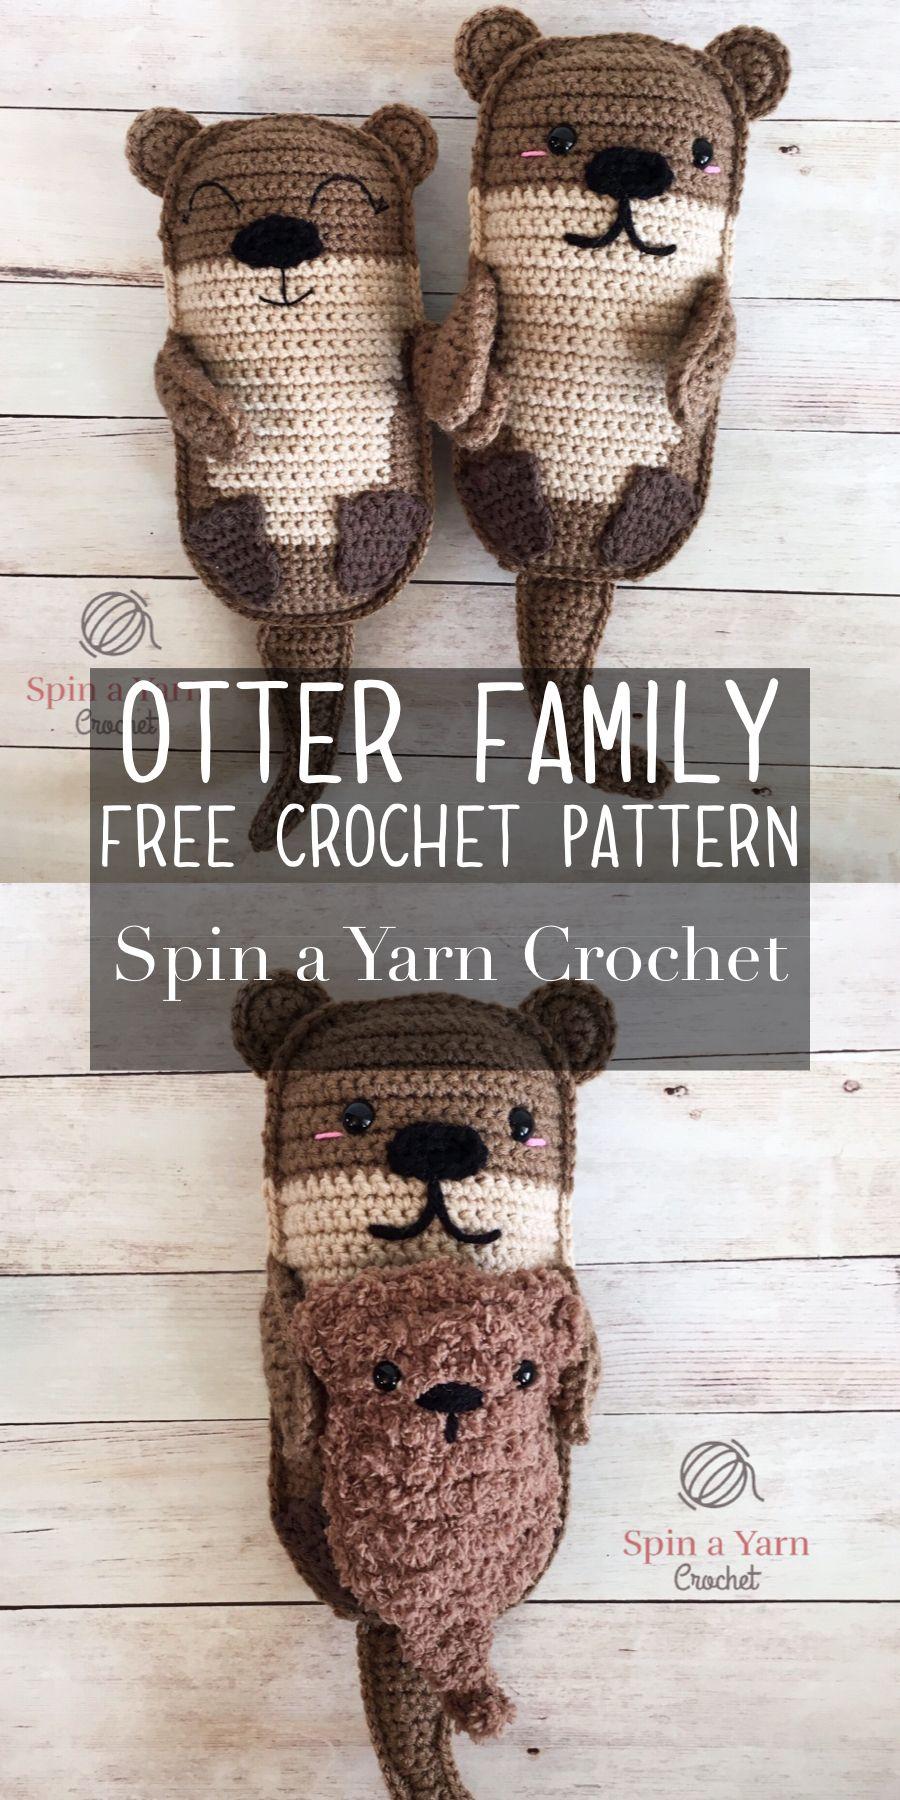 Otter Family Free Crochet Pattern Spin A Yarn Crochet Baby Gifts